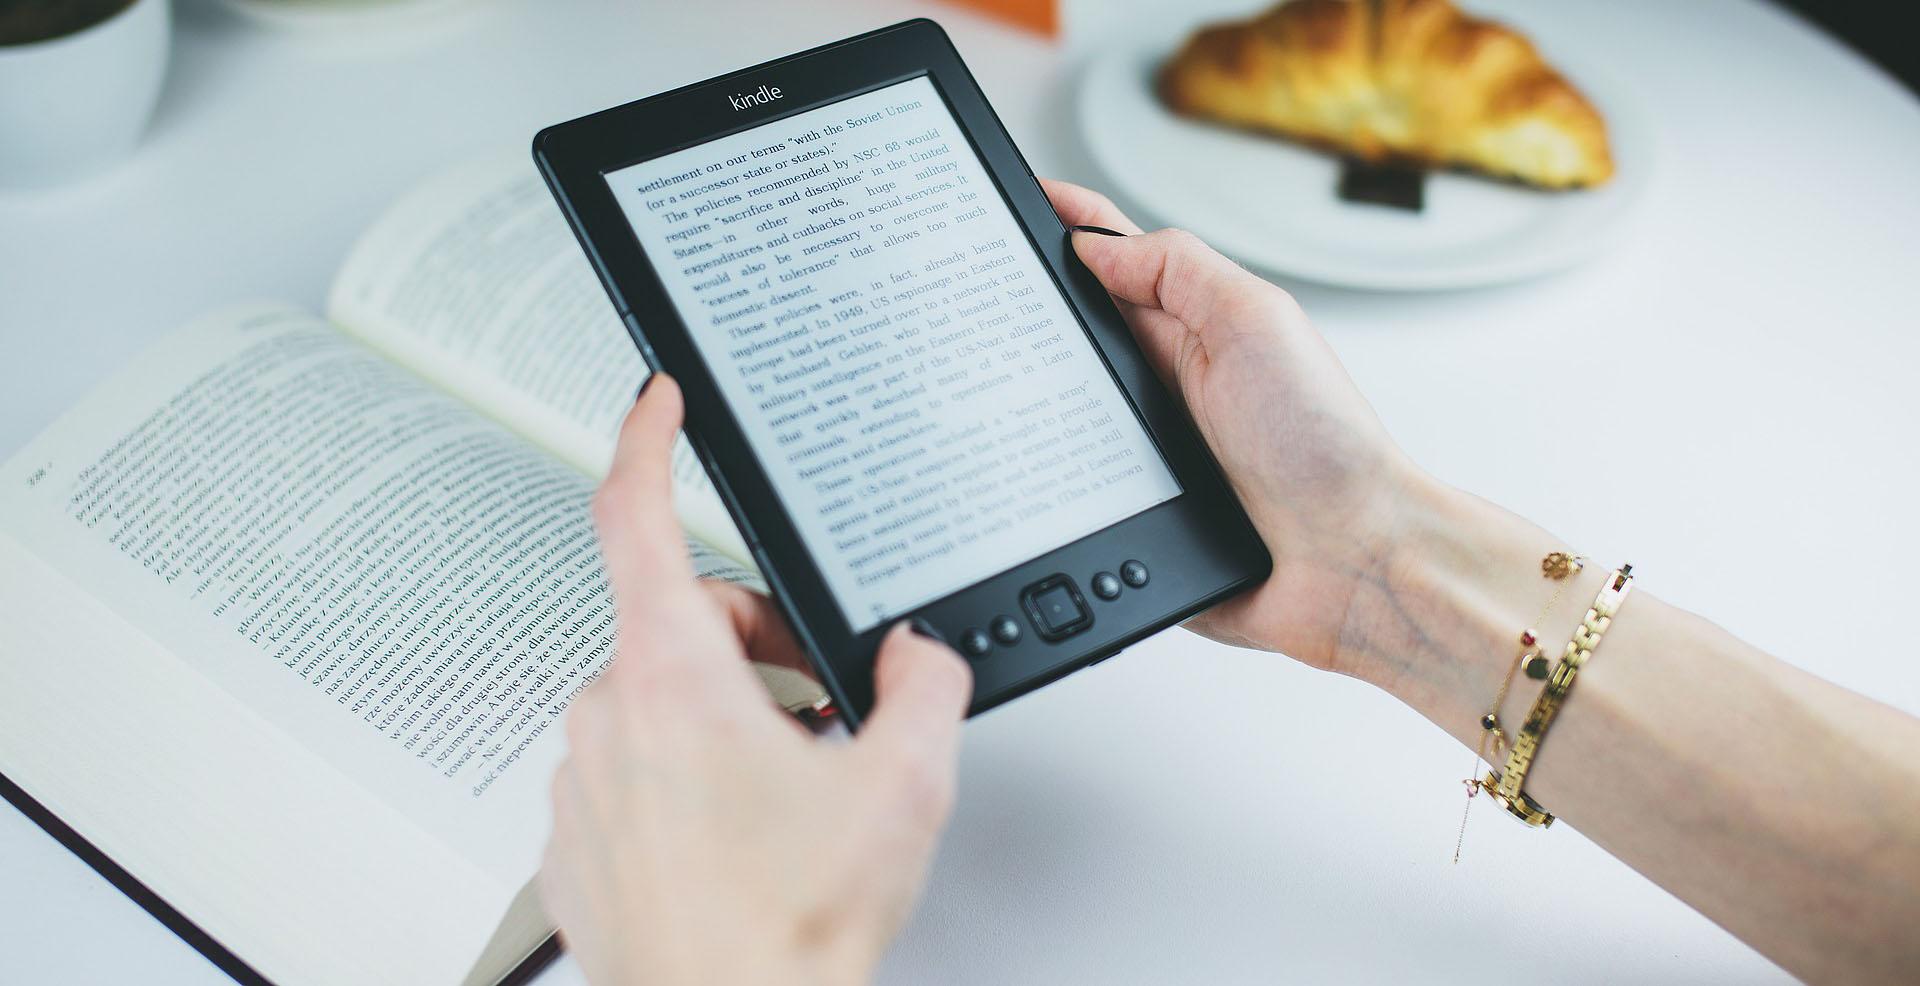 Conviene comprare un Kindle